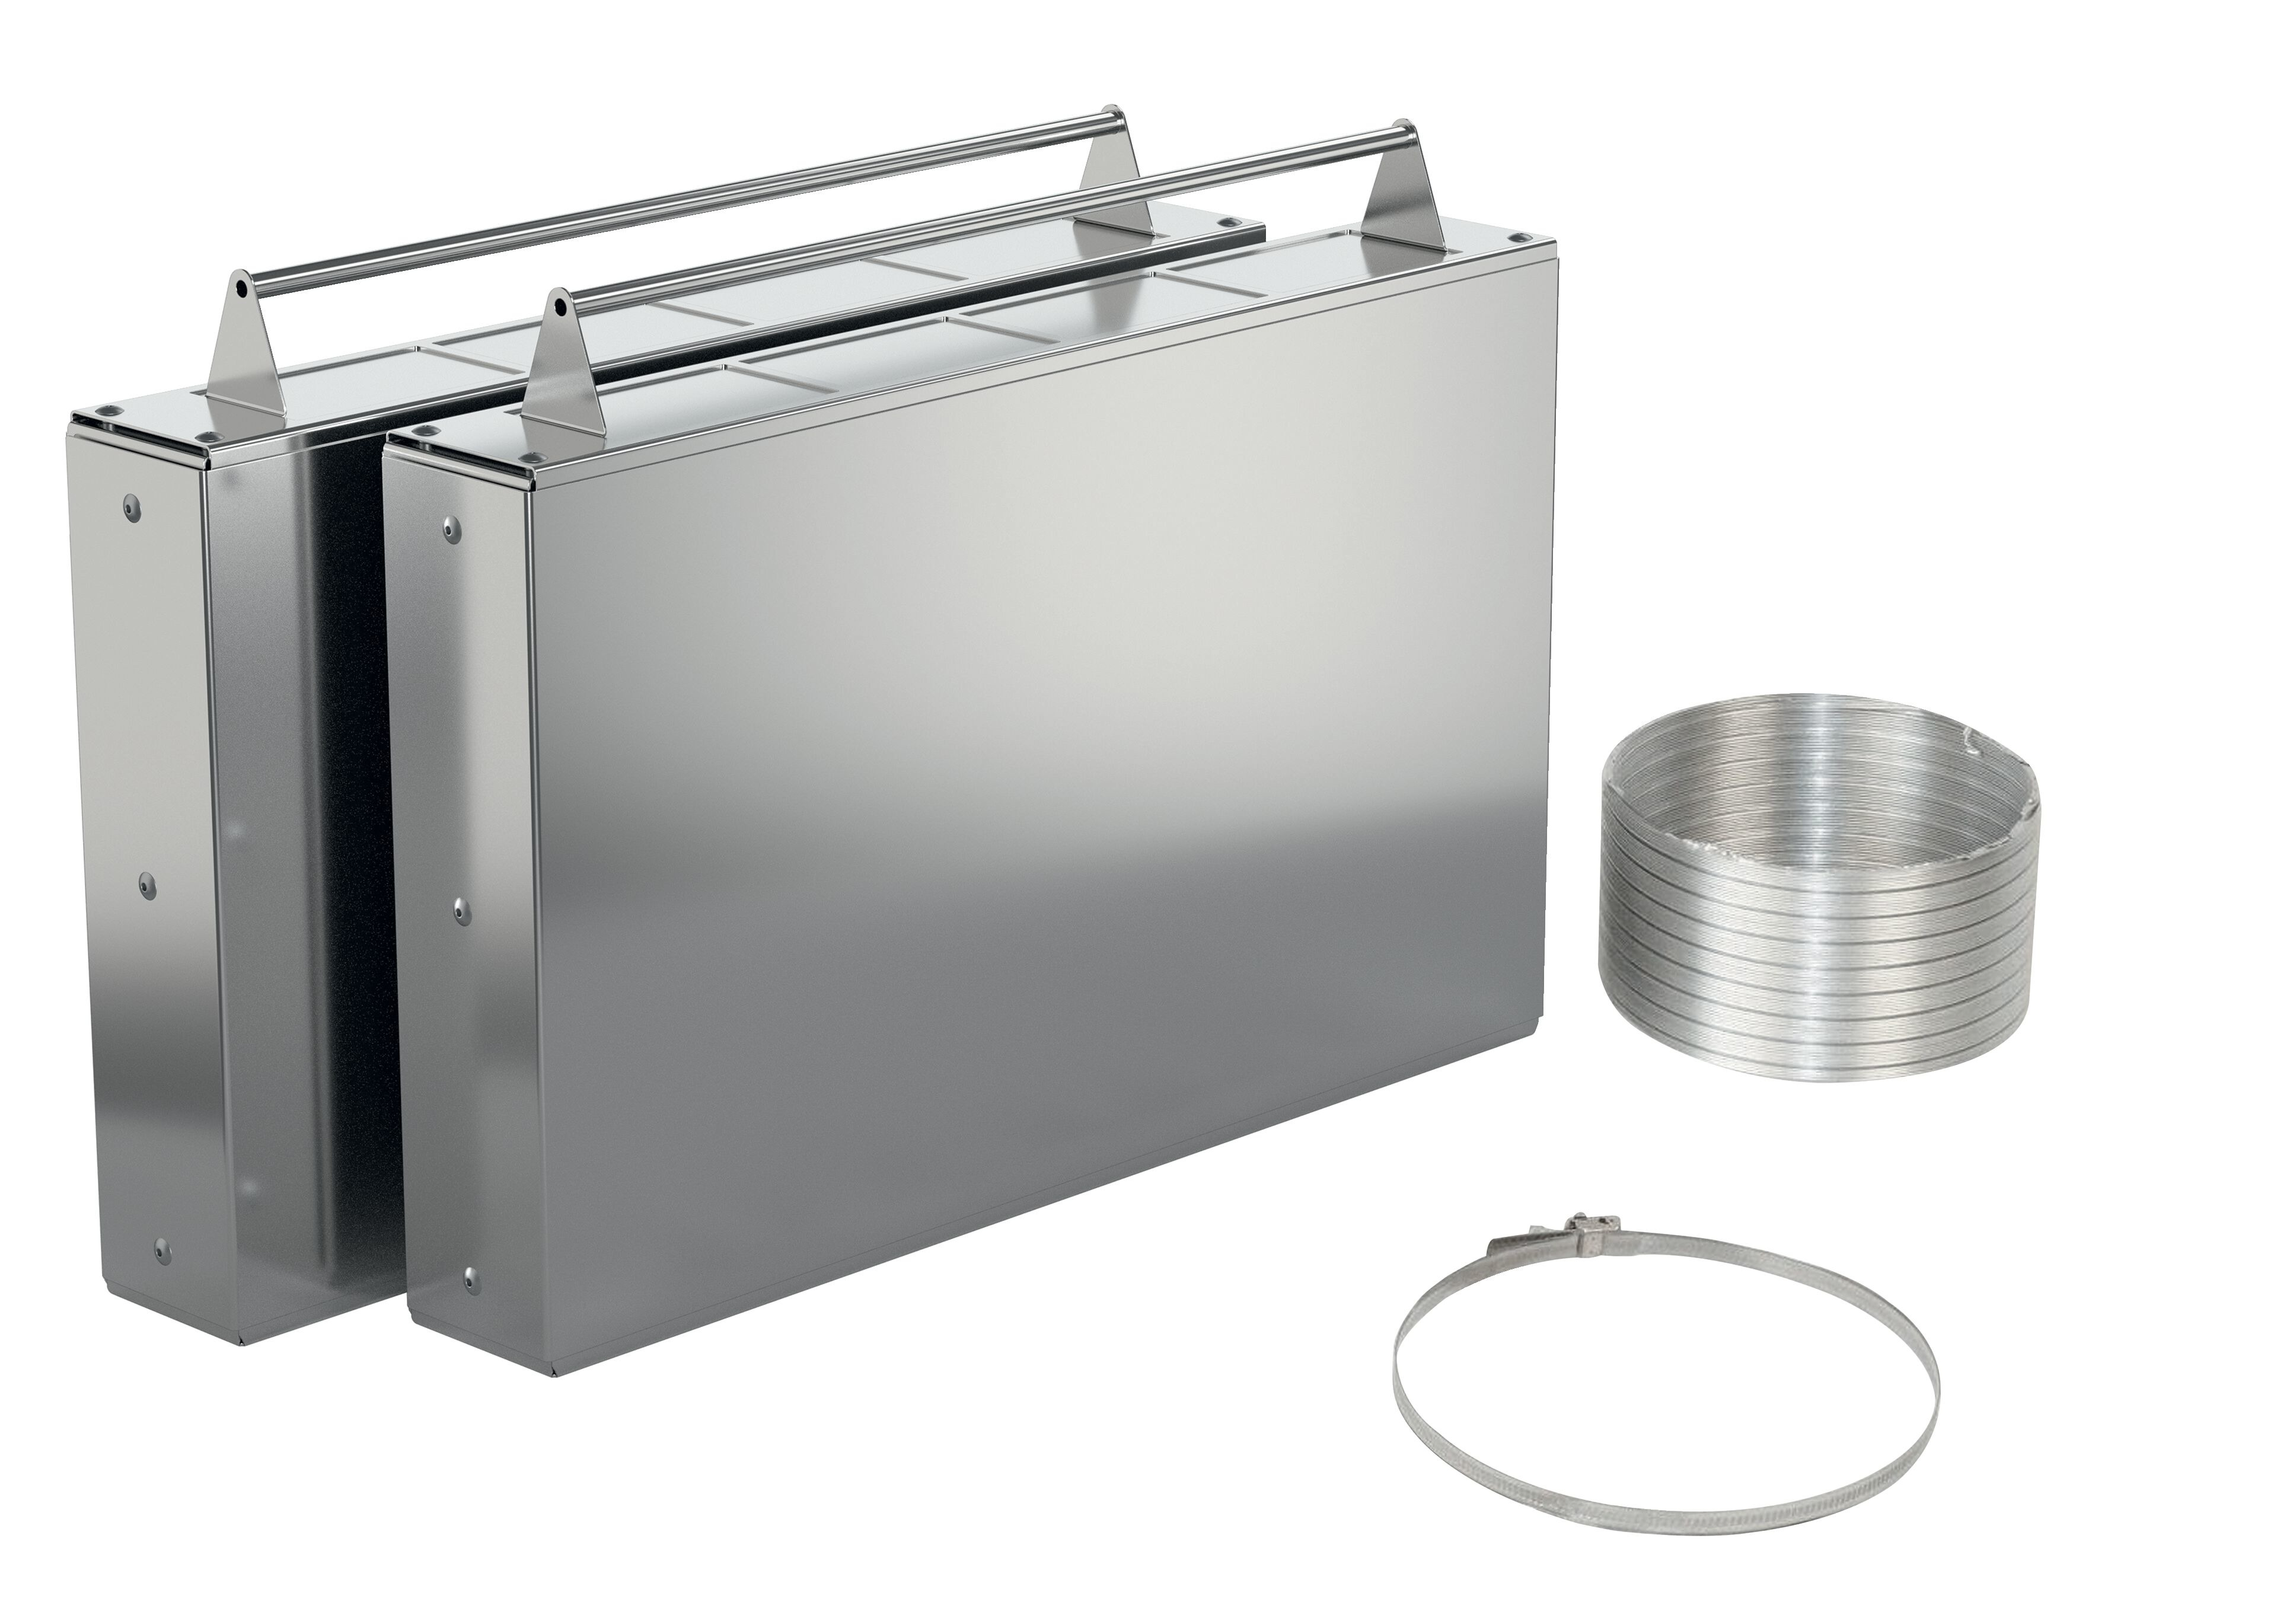 Bosch DSZ1WW1J1 Afzuigkap accessoire Aluminium